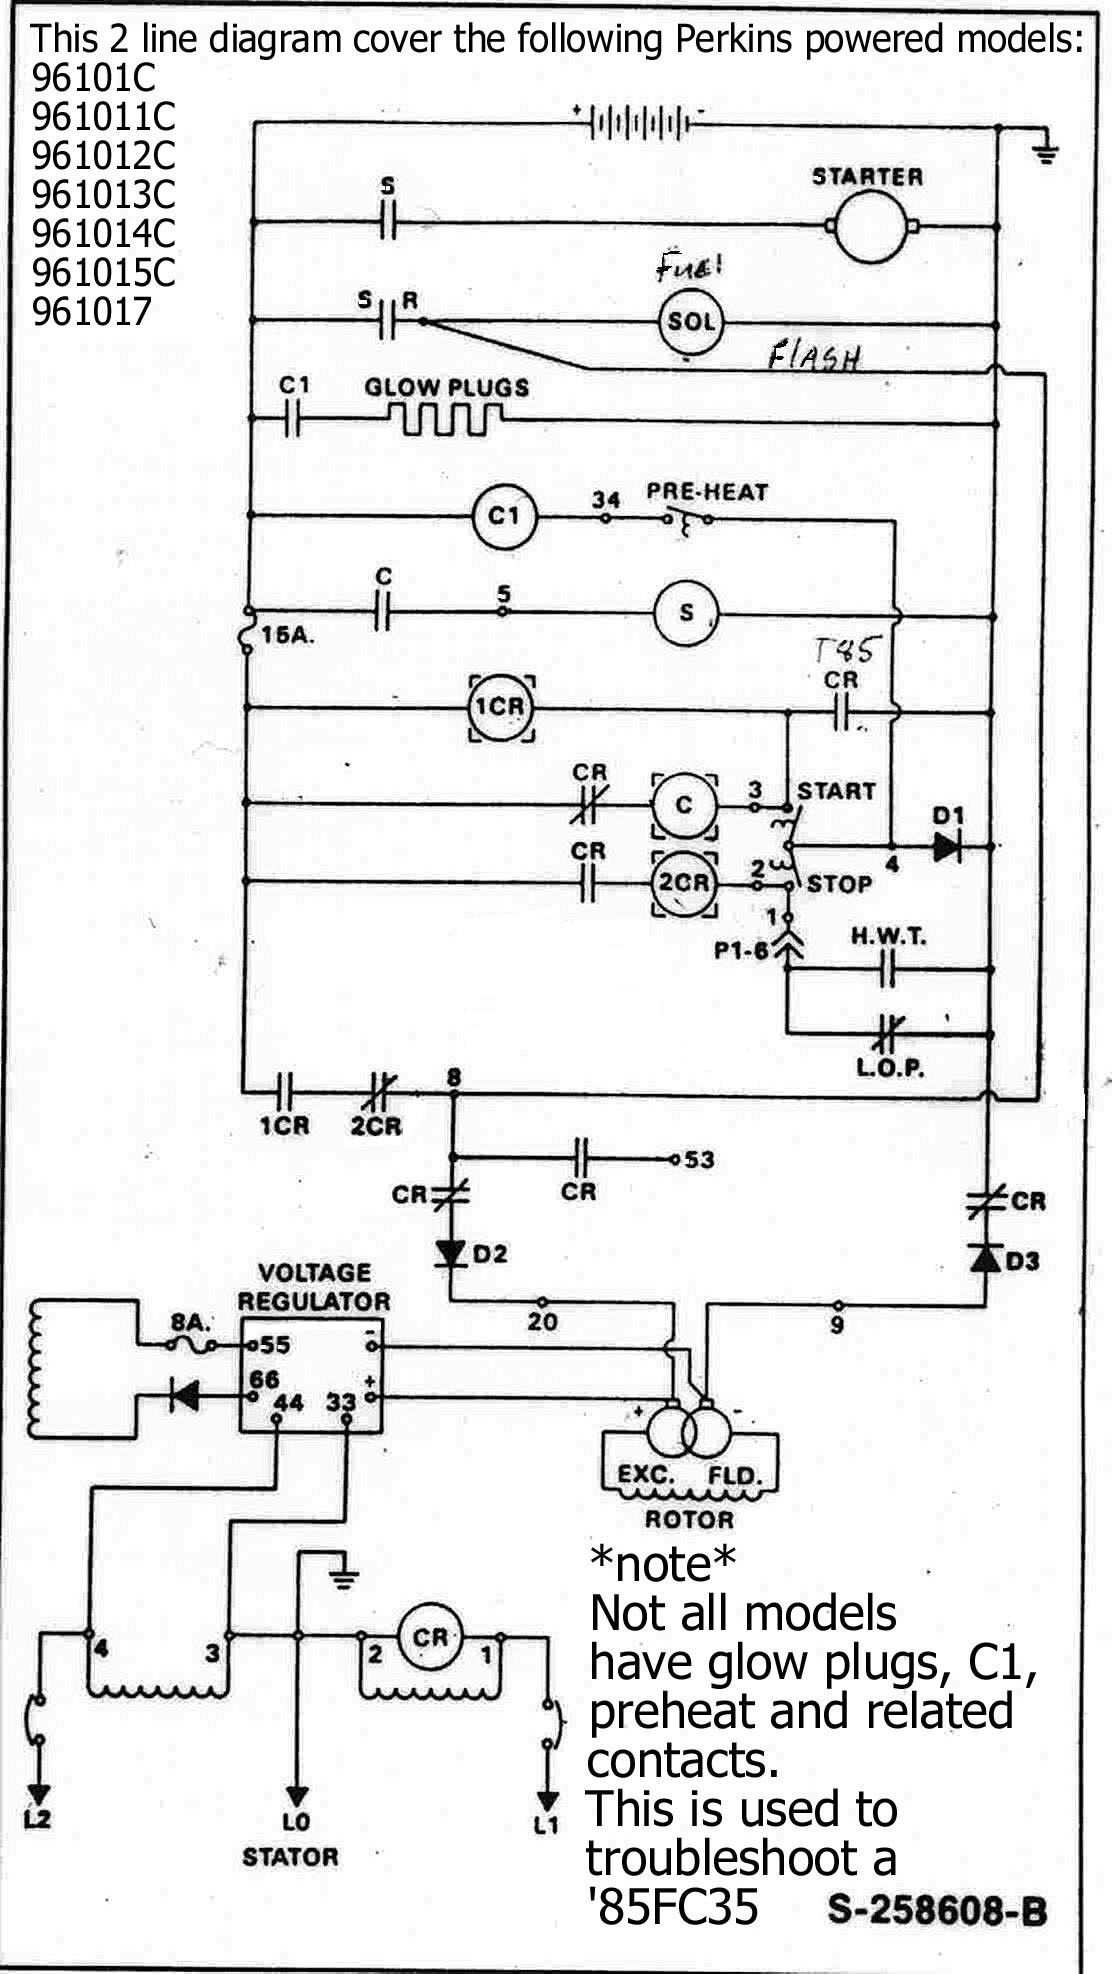 Perkins Wiring Diagram from i.pinimg.com